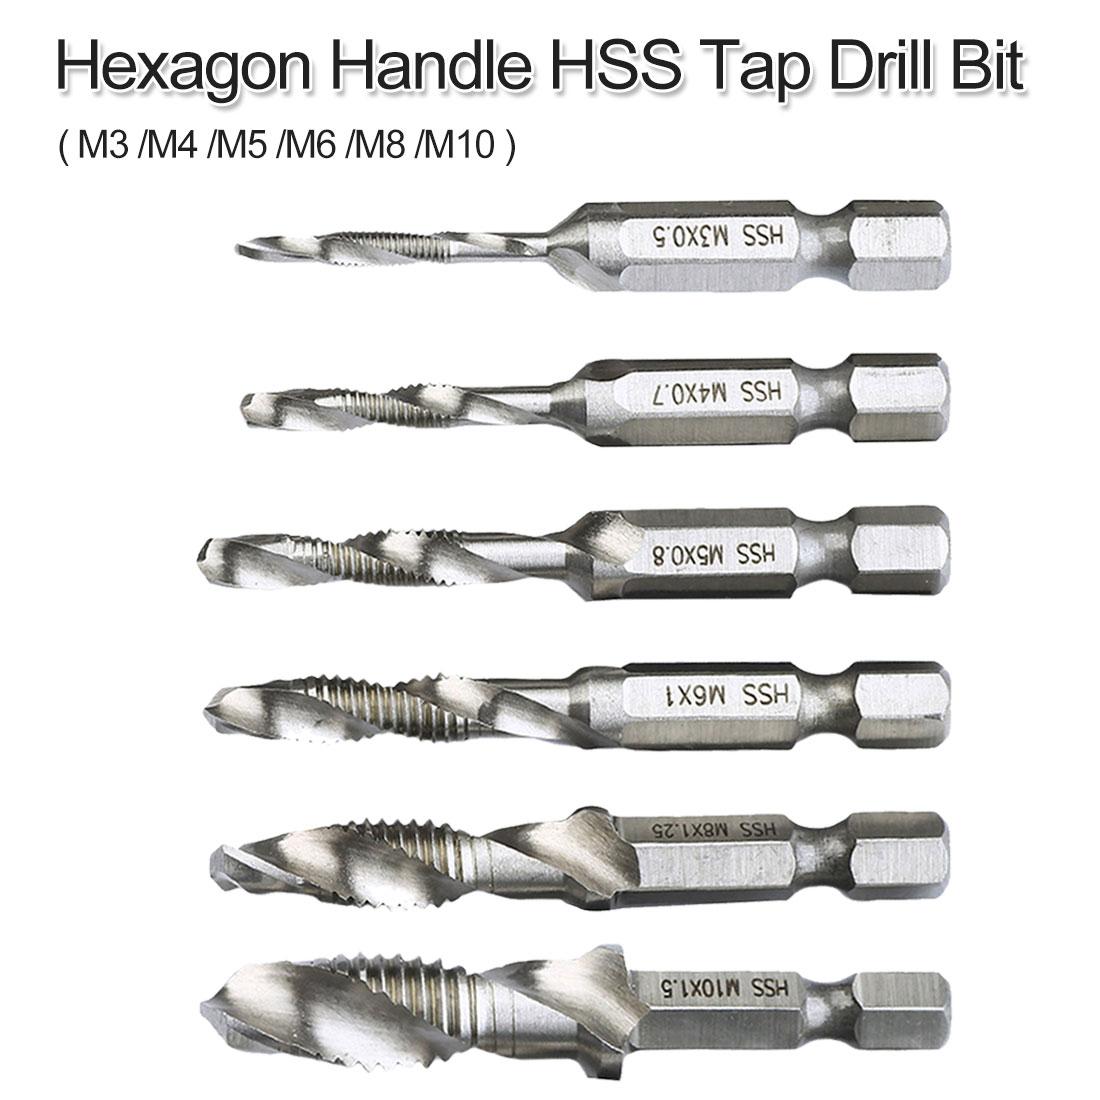 "M3/M4/M5/M6/M8/M10 broca giratoria 1/4 ""mango hexagonal grifo de mano HSS clavija roscada broca para carpintería herramienta cortadora de agujeros"